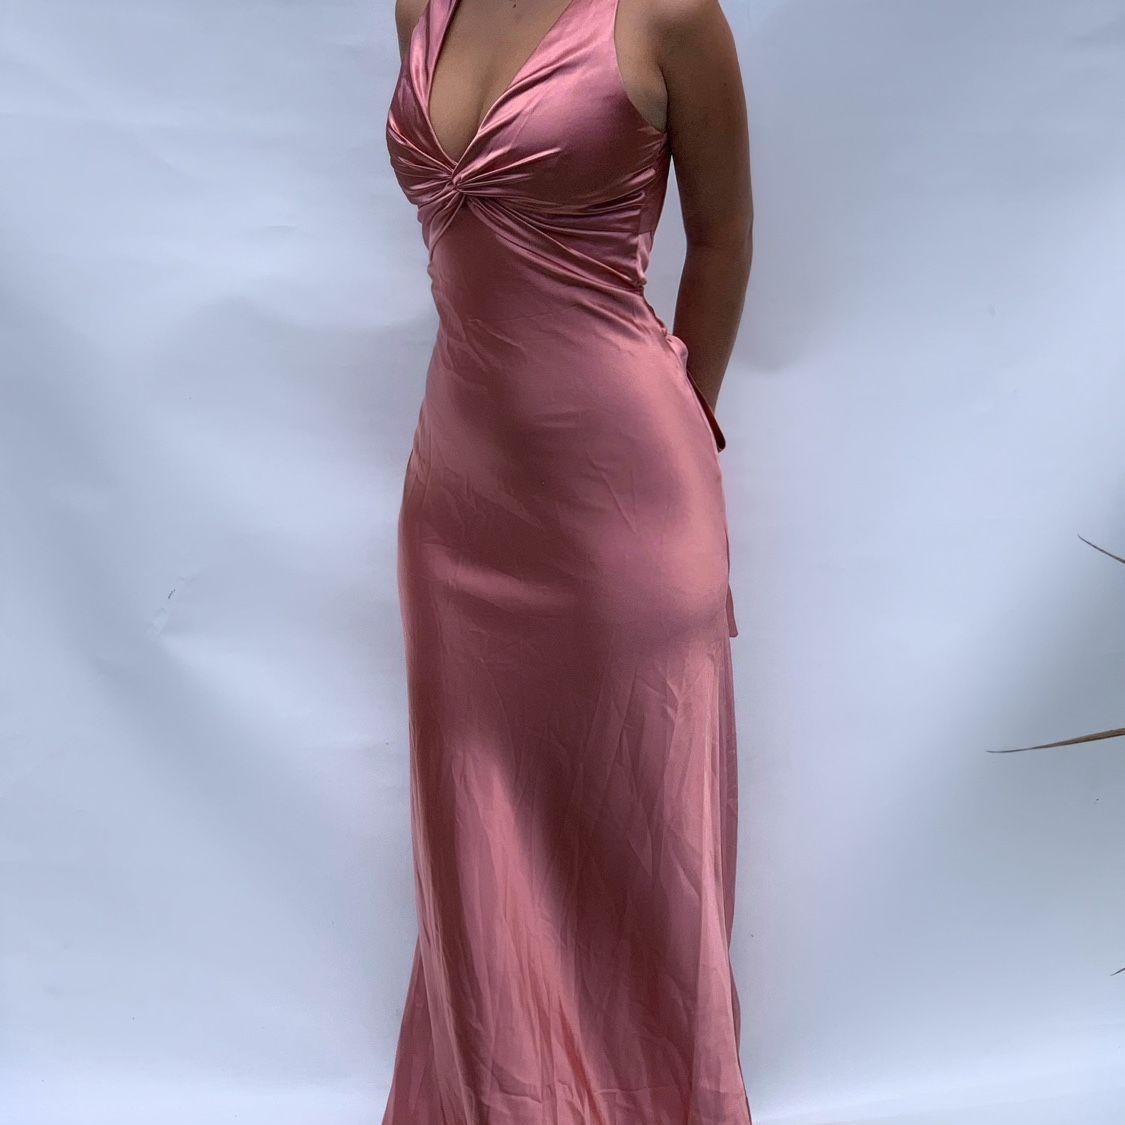 Gorgeous Pink Silk Early 2000s Vintage Dress Depop In 2021 Ball Dresses Dresses Vintage Formal Dresses [ 1125 x 1125 Pixel ]